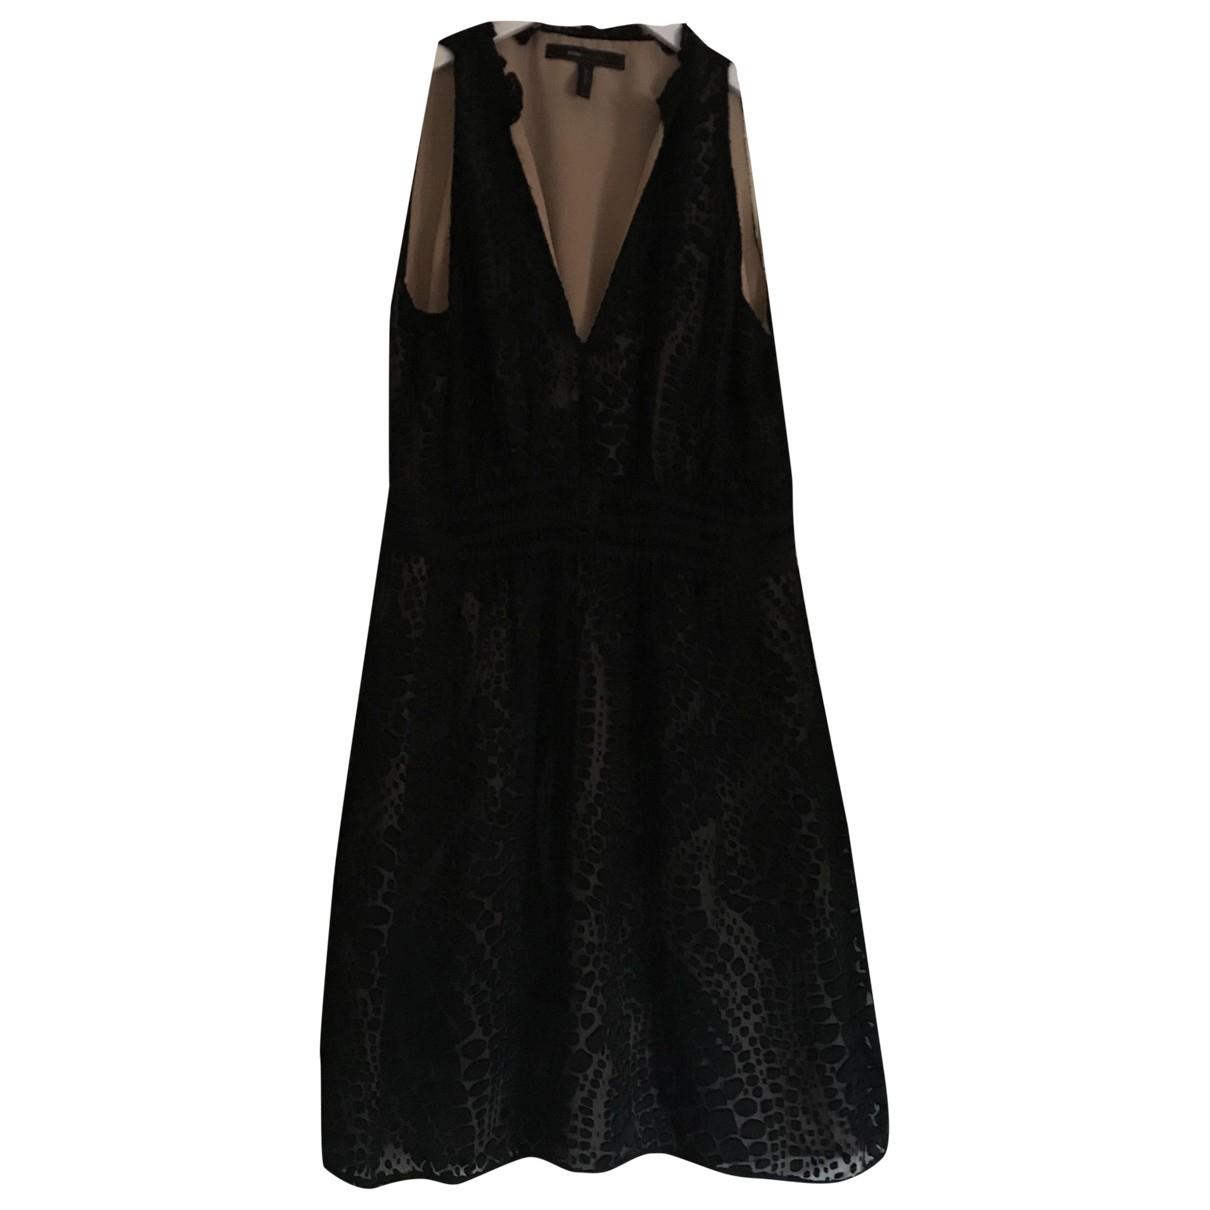 Bcbg Max Azria \N Black dress for Women S International